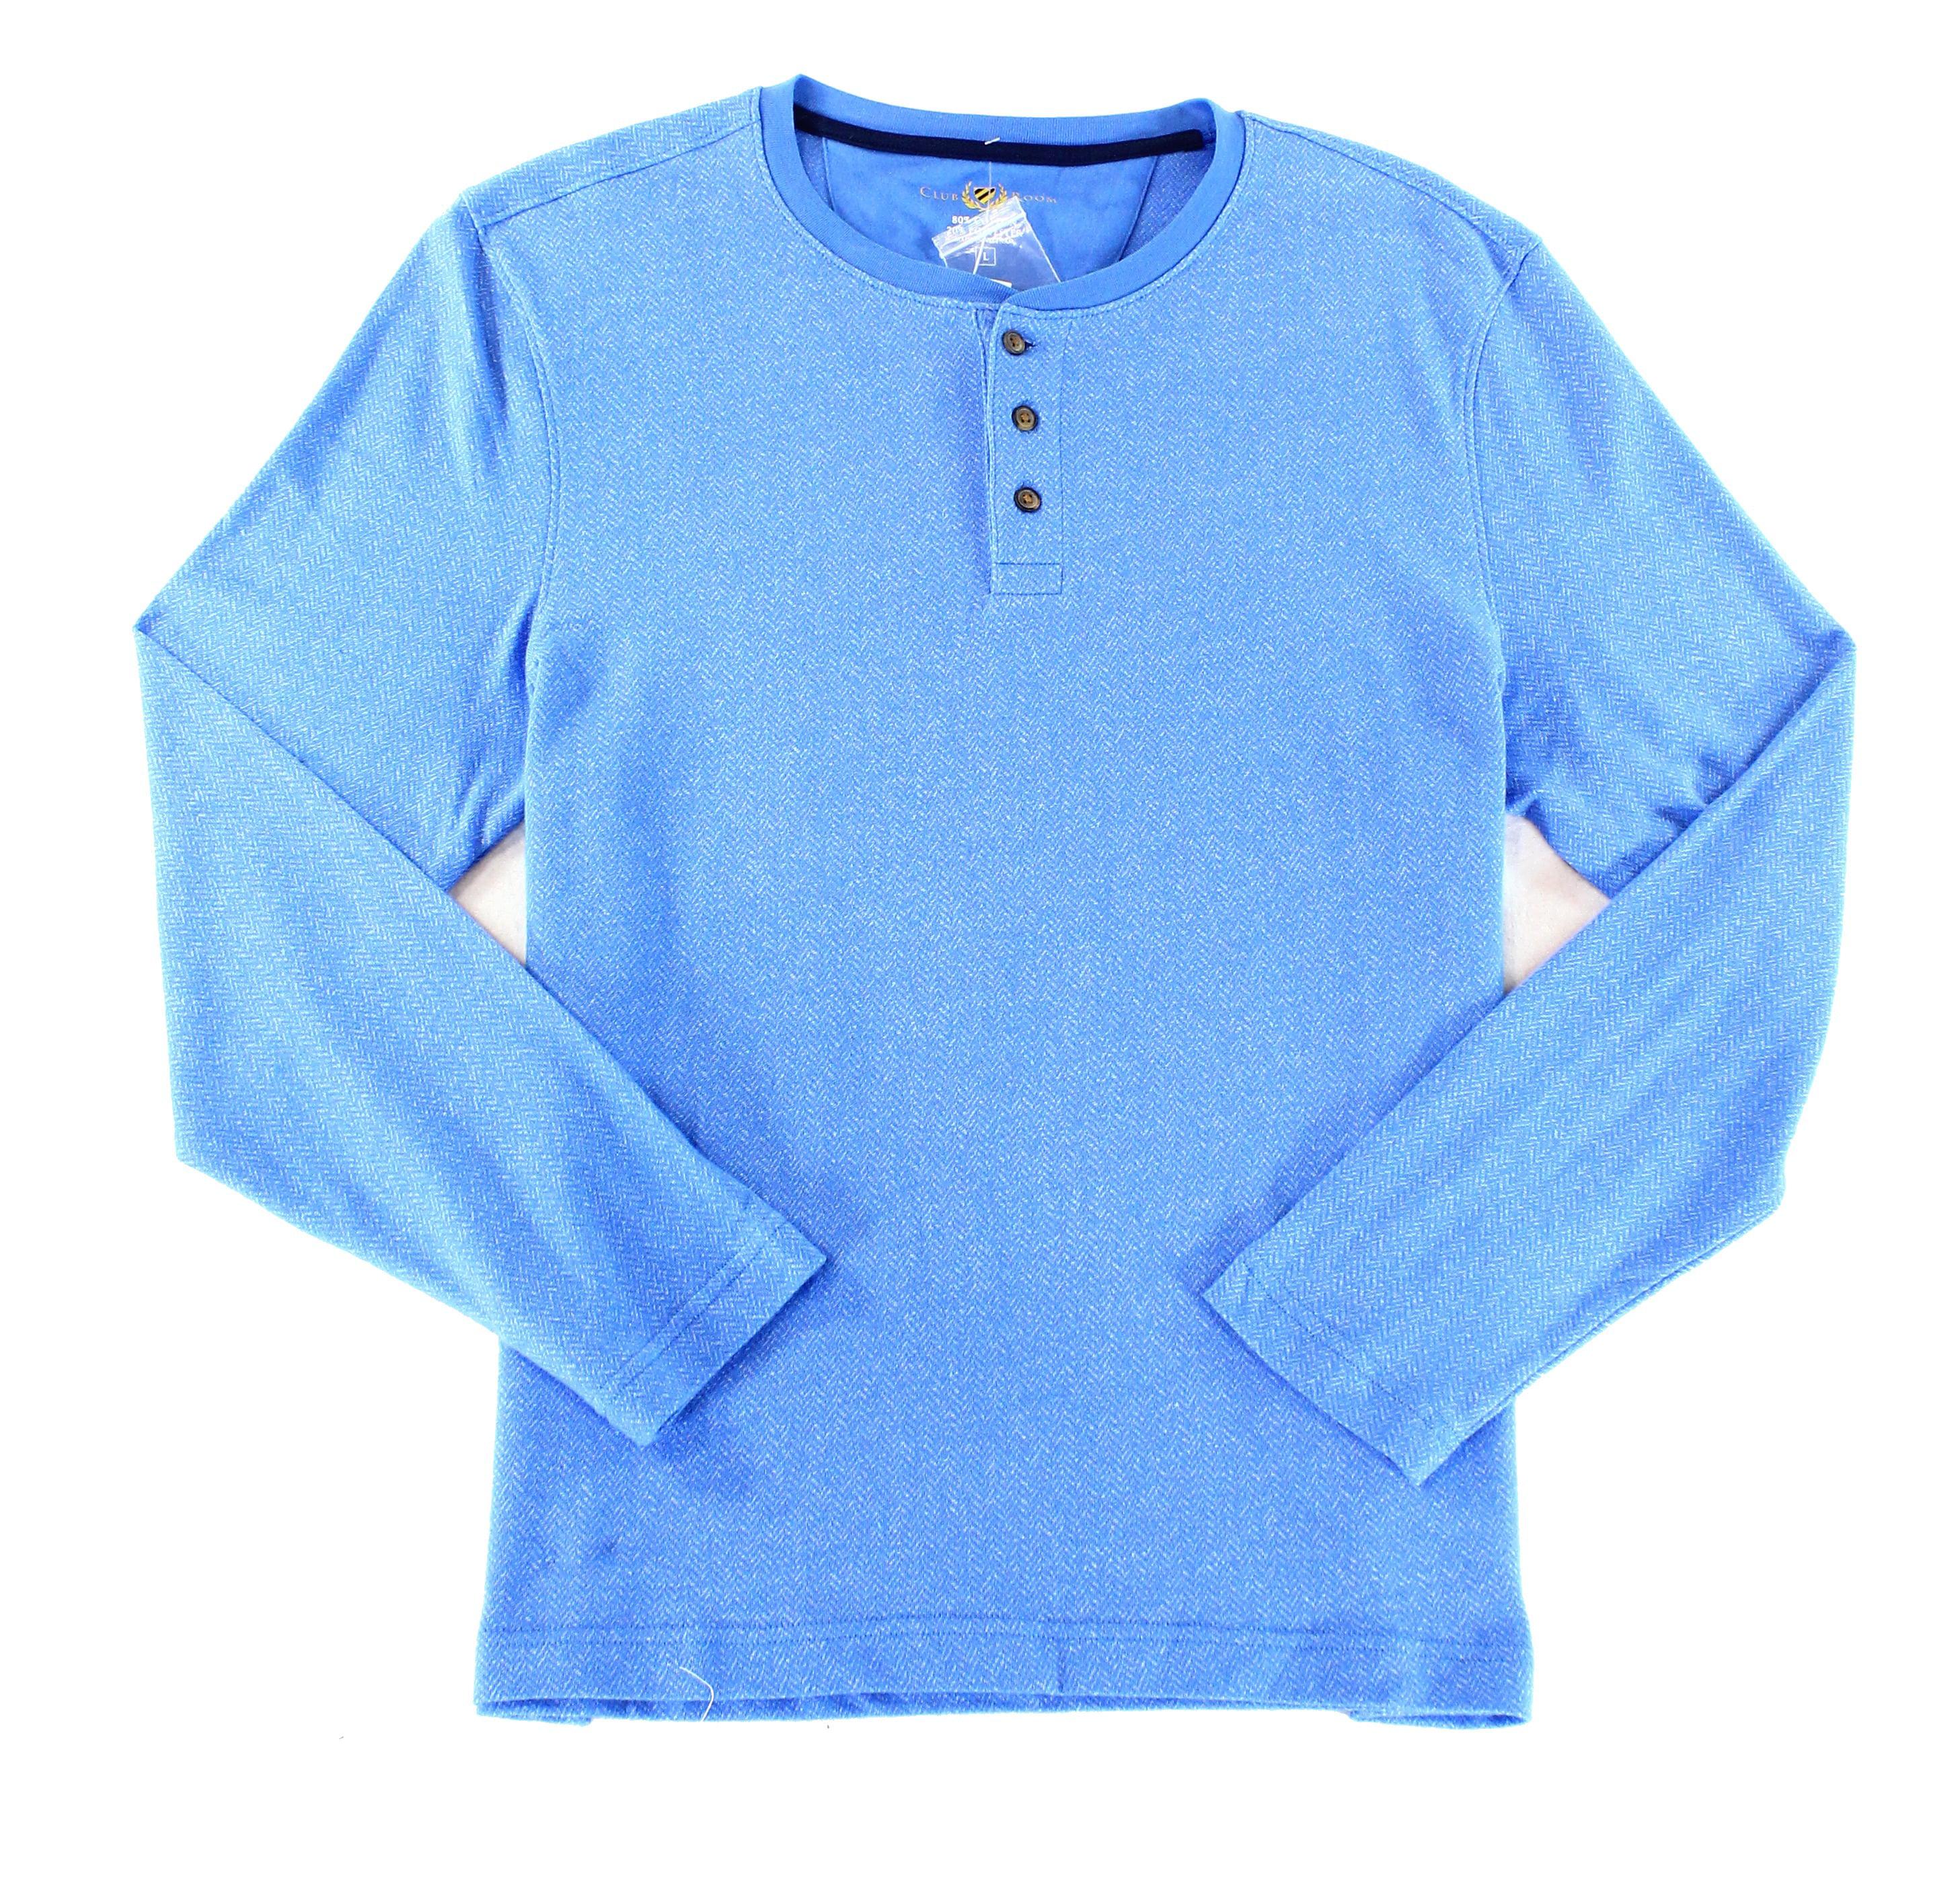 62531bf047d3 Club Room NEW Palace Blue Mens Size Large L Herringbone Henley Shirt ...